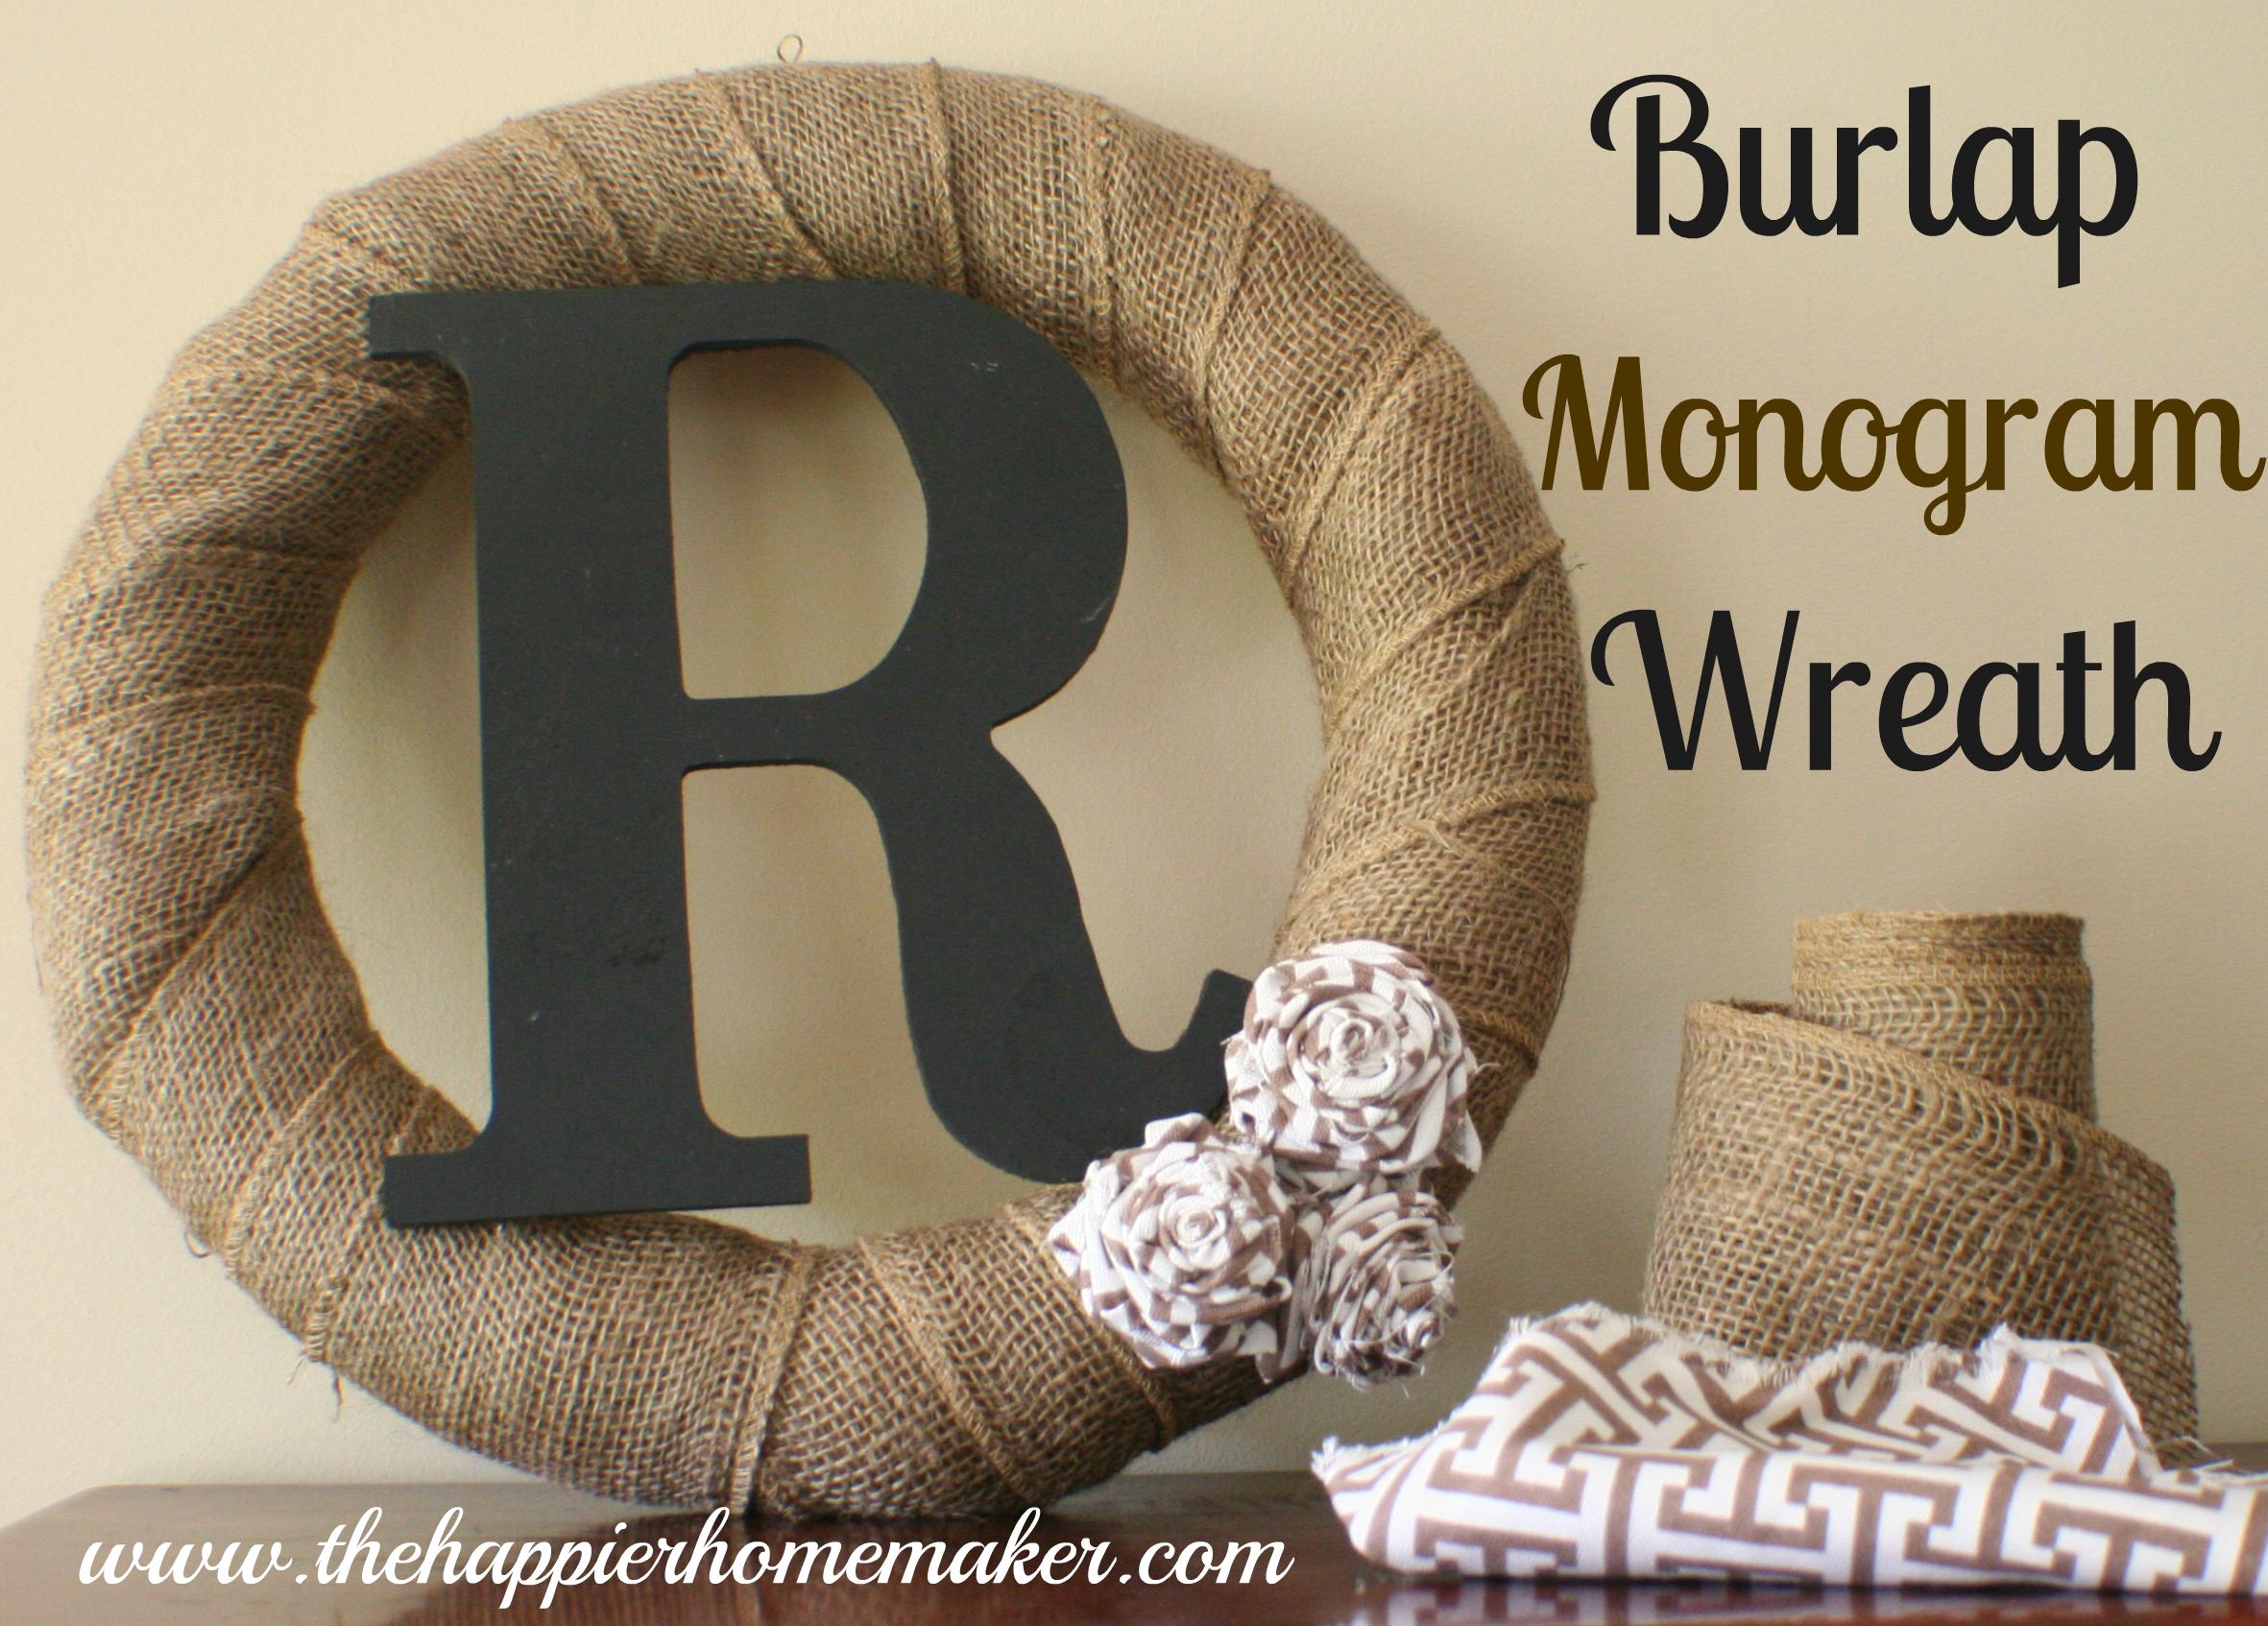 burlap monogram wreat - so simple and beautiful. I love it ...